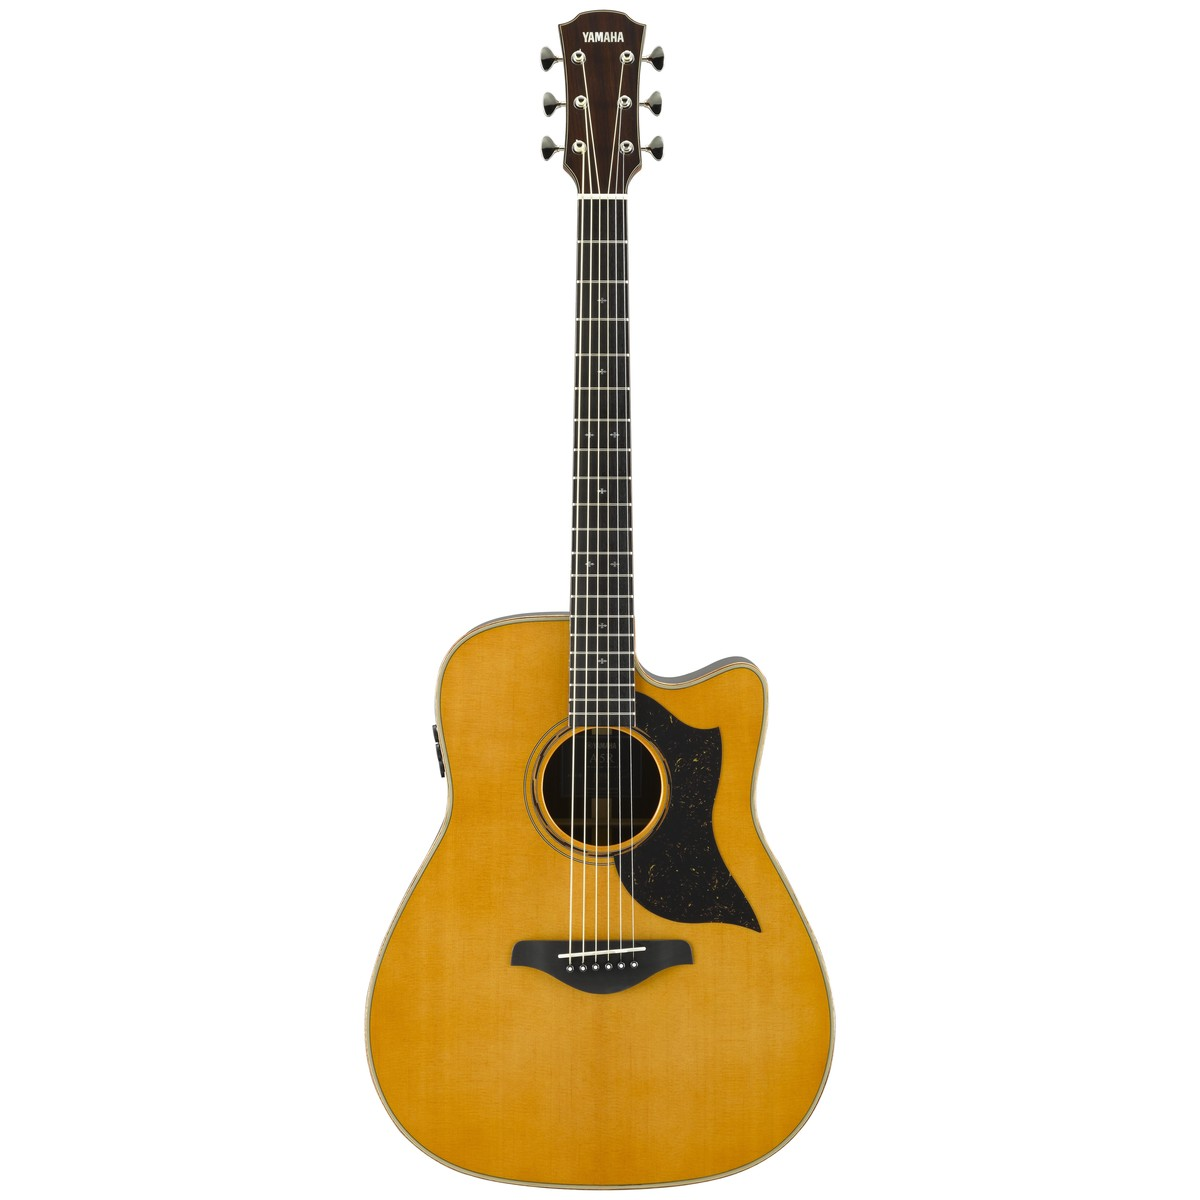 Yamaha A5r Rosewood Electro Acoustic Guitar Vintage Natural At